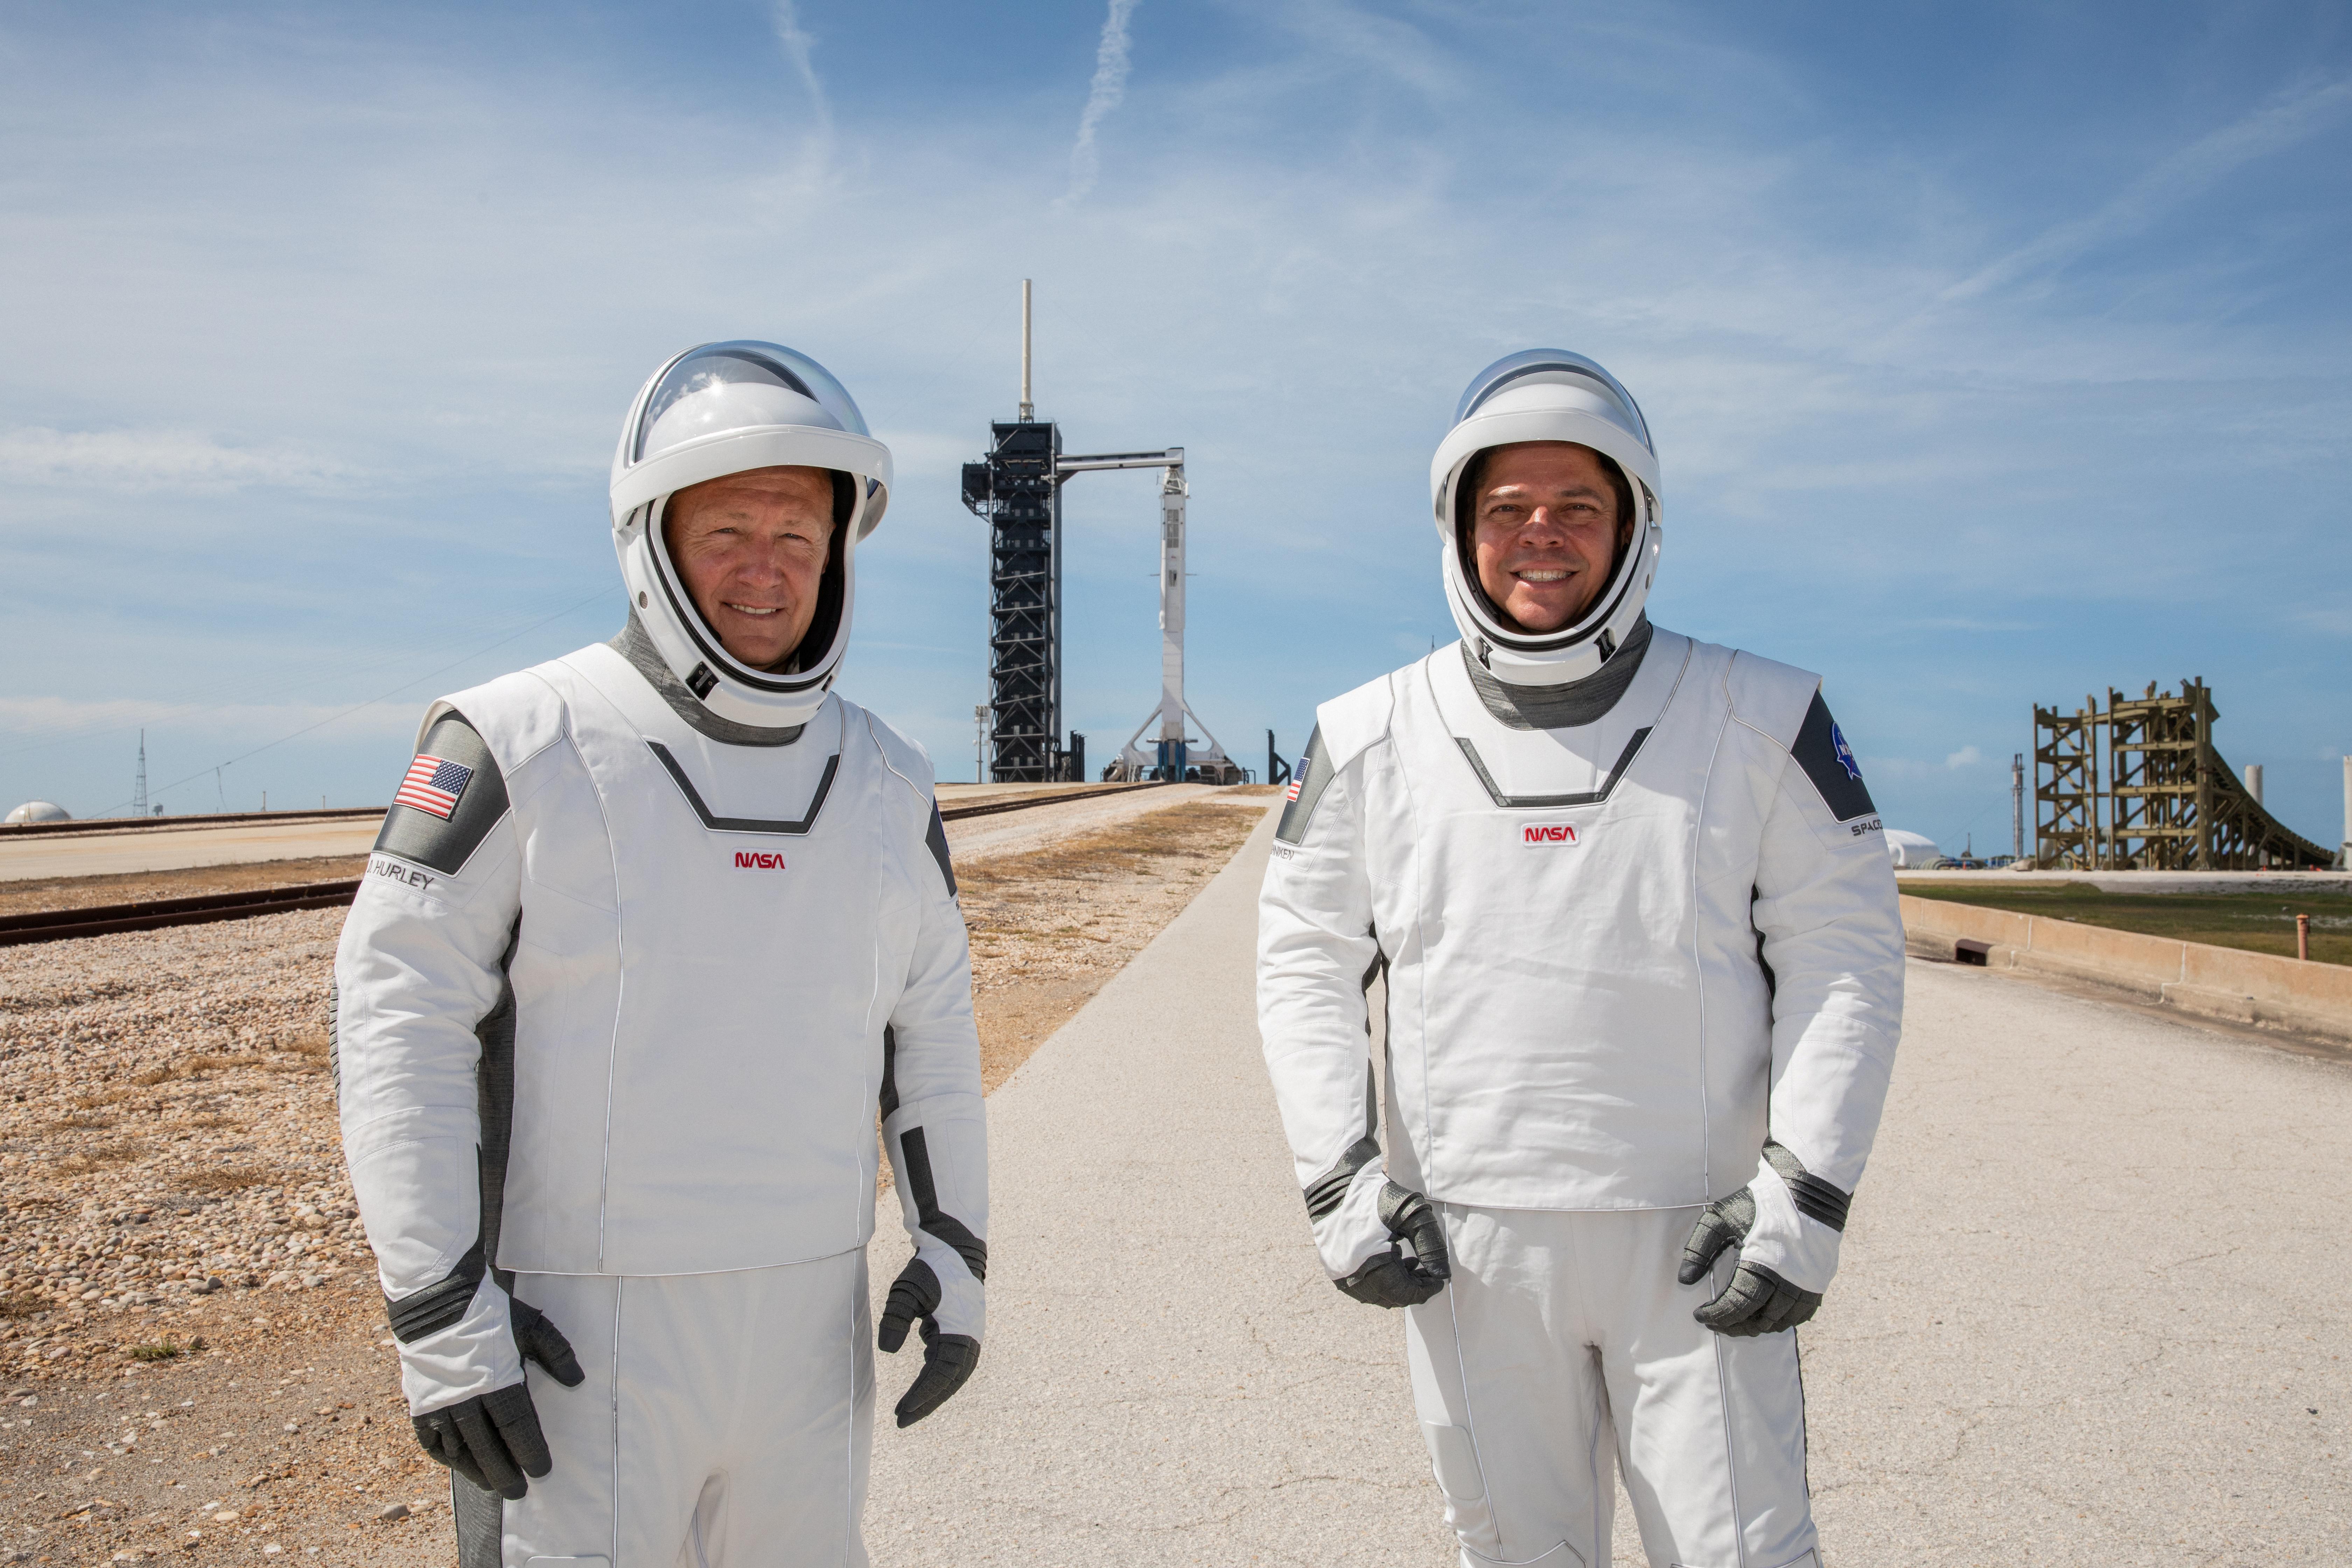 Los astronautas Douglas Hurley y Robert Behnken (NASA/Kim Shiflett via REUTERS)